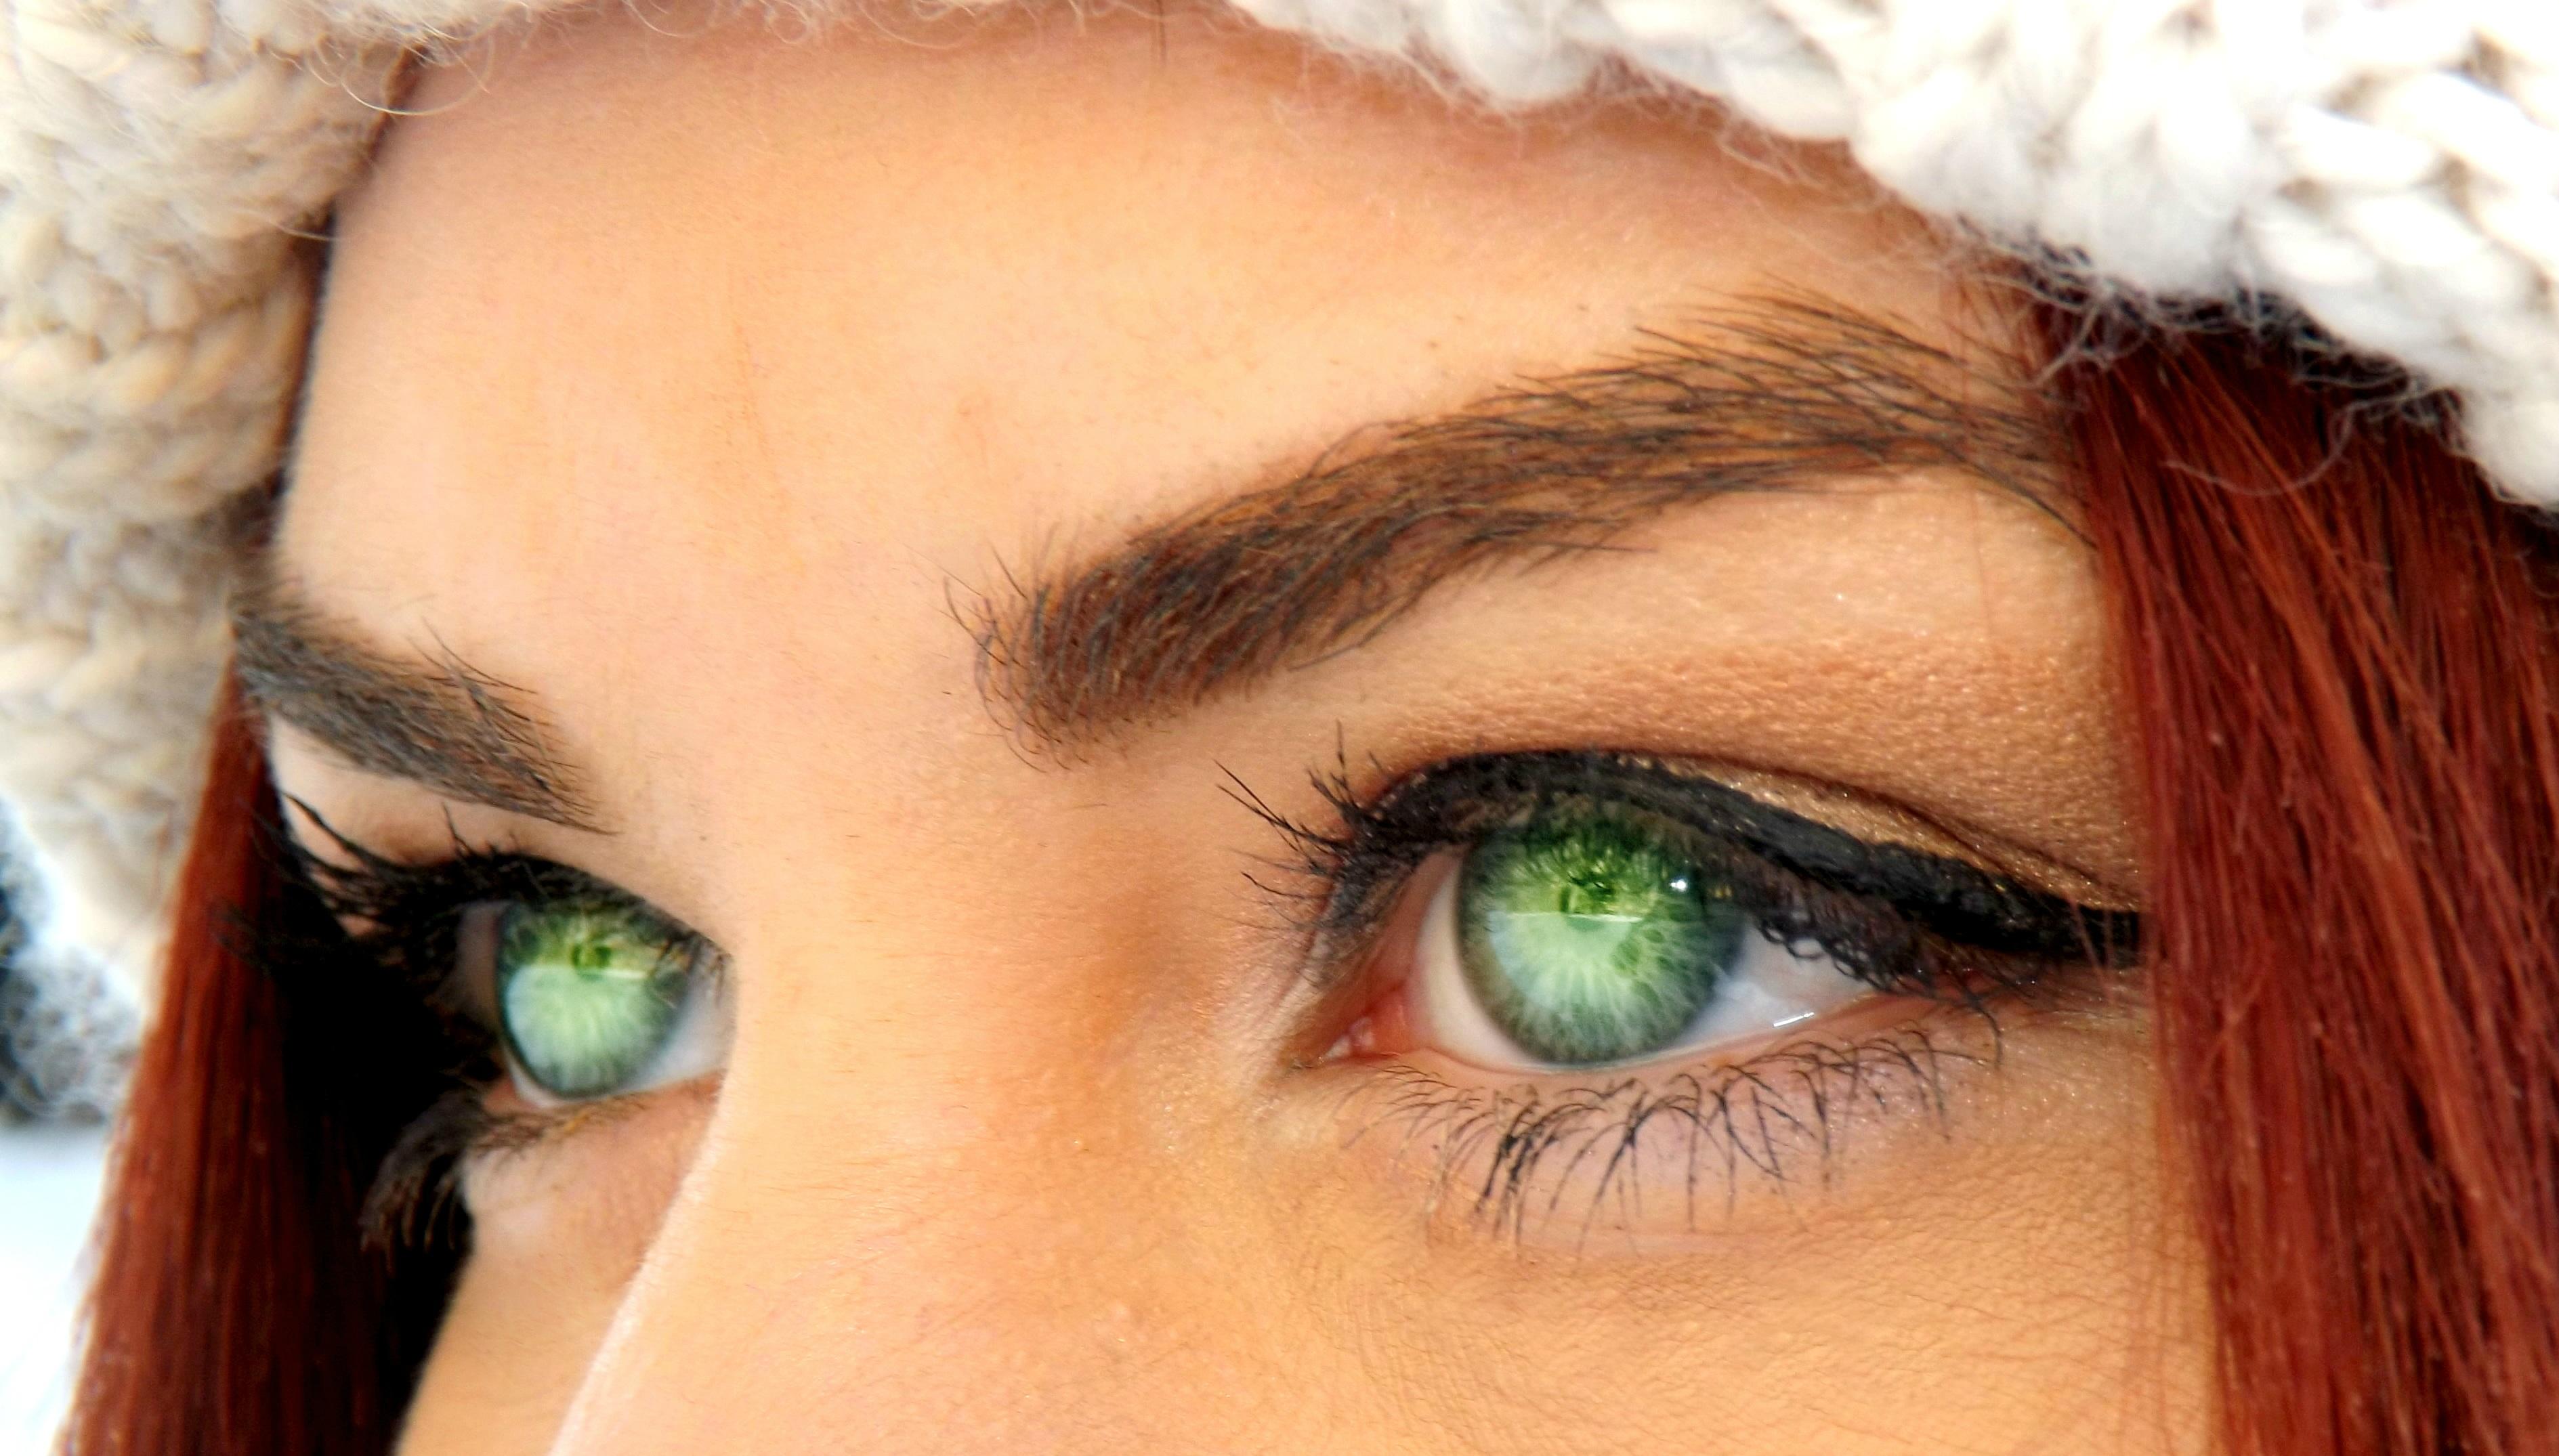 Free Fotobanka Zelena Cervene Barva Ucho Ret Uces Makeup